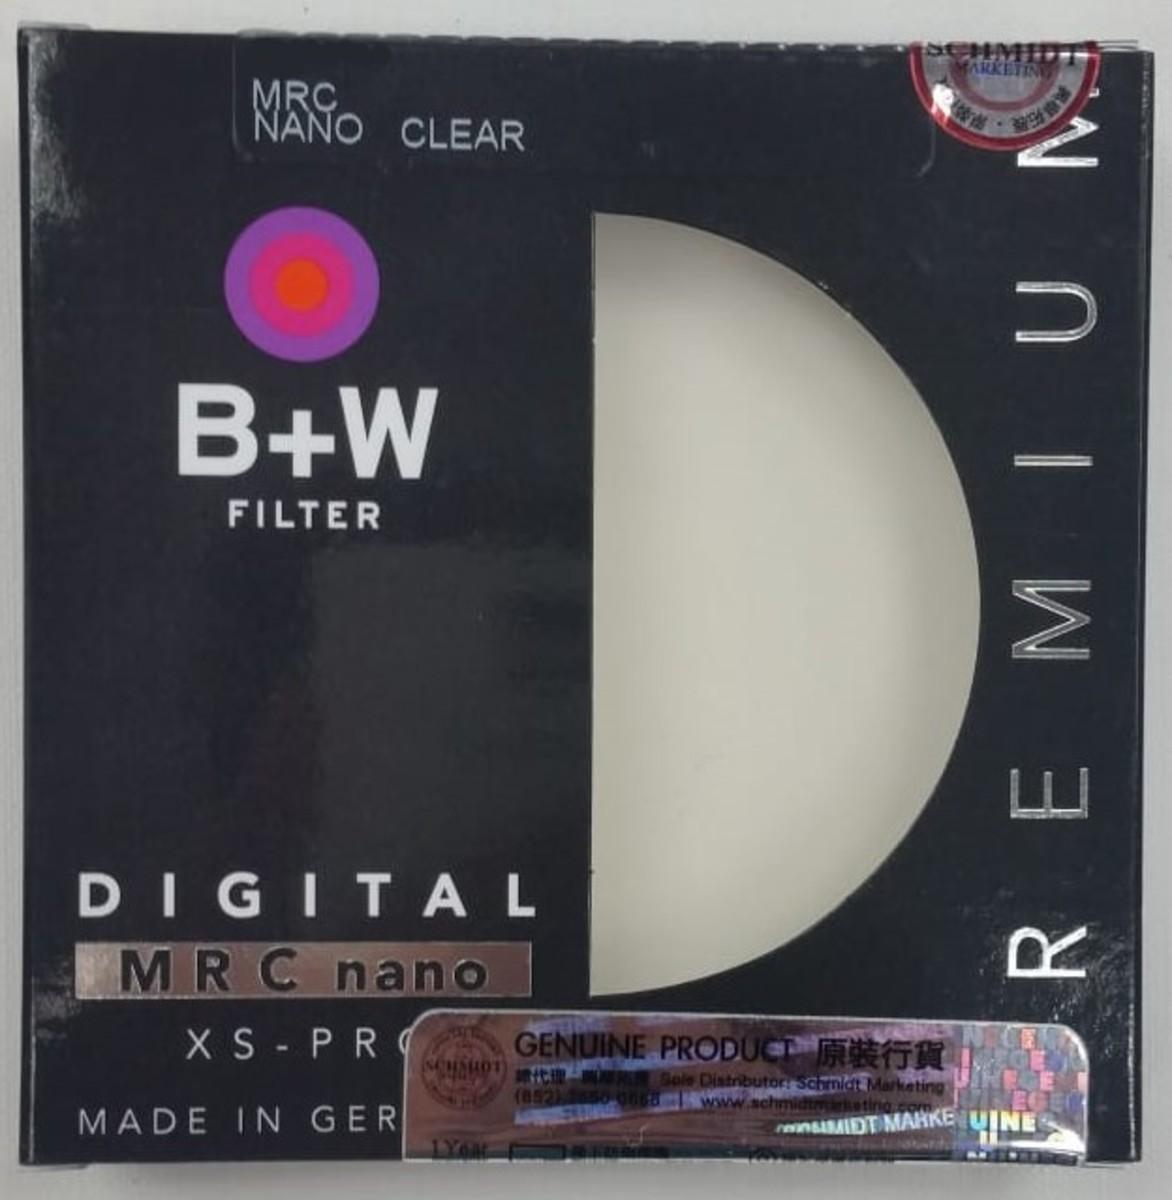 40.5mm XS-Pro Digital 007 Clear filter MRC nano Protector頂級保護鏡